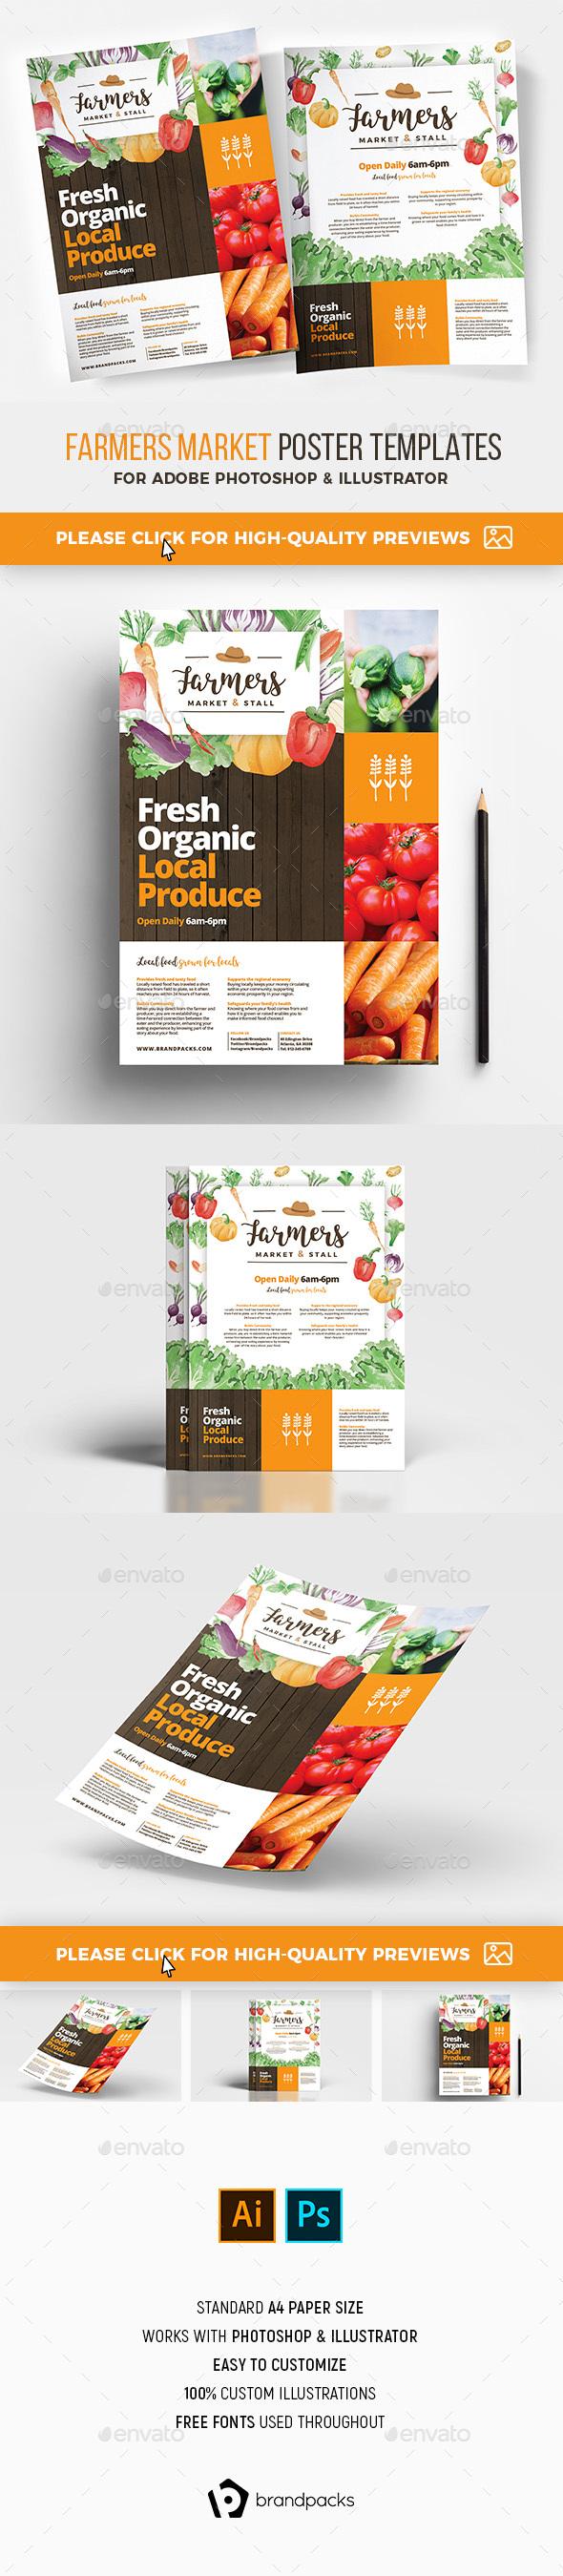 Farmers Market Poster Templates - Restaurant Flyers